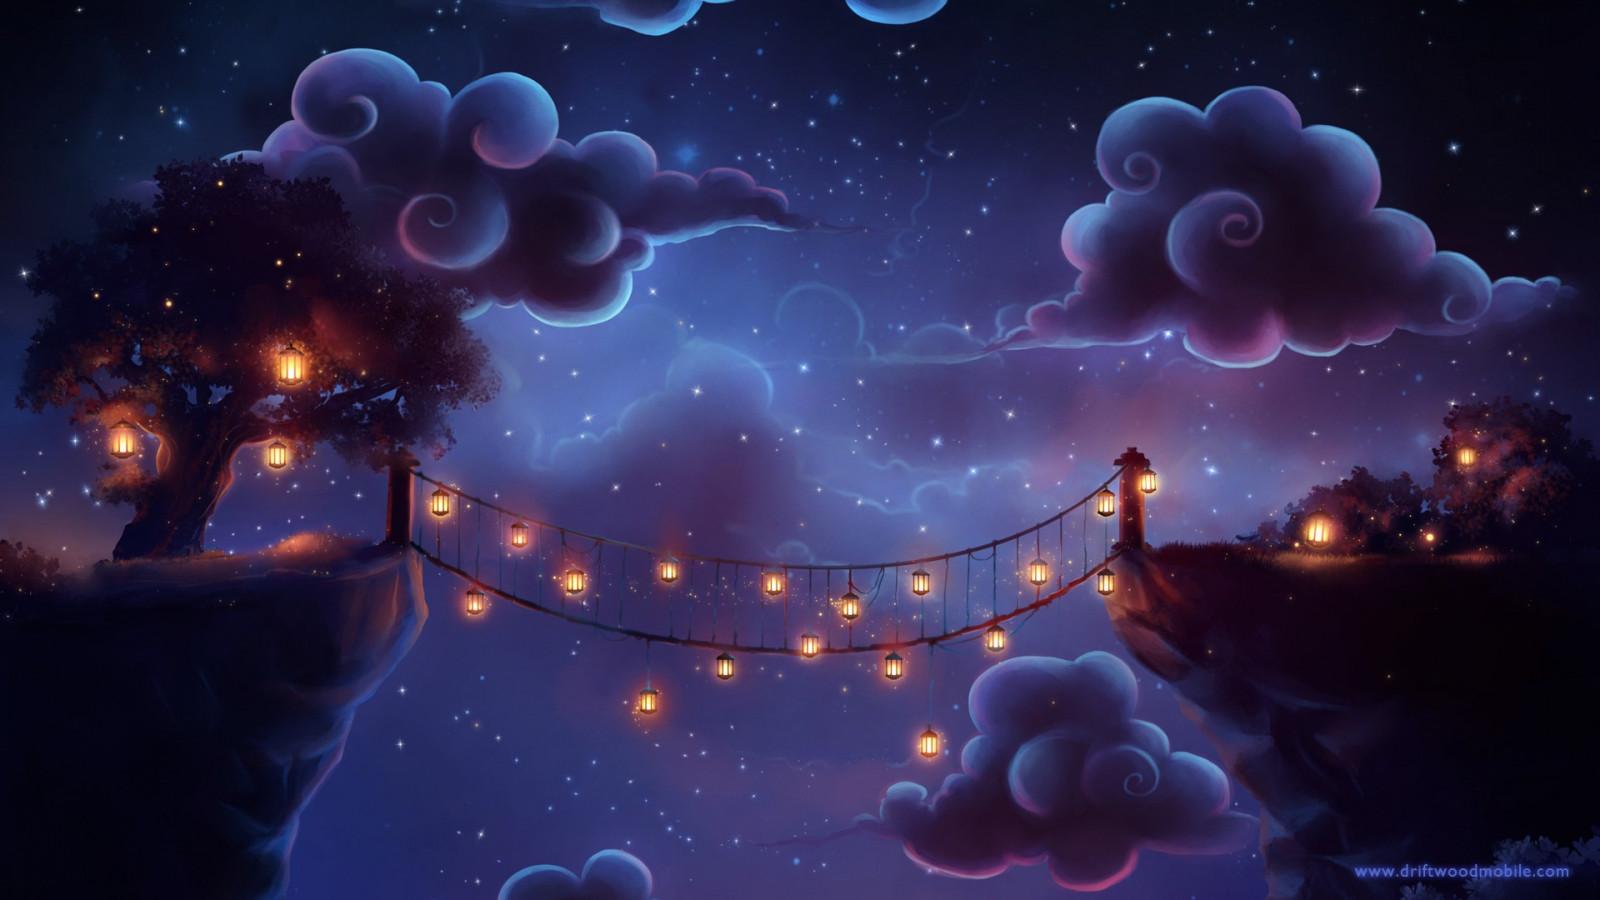 https://c.wallhere.com/photos/d7/b0/clouds_artwork_lantern_bridge_cliff_stars_watermarked-159152.jpg!d